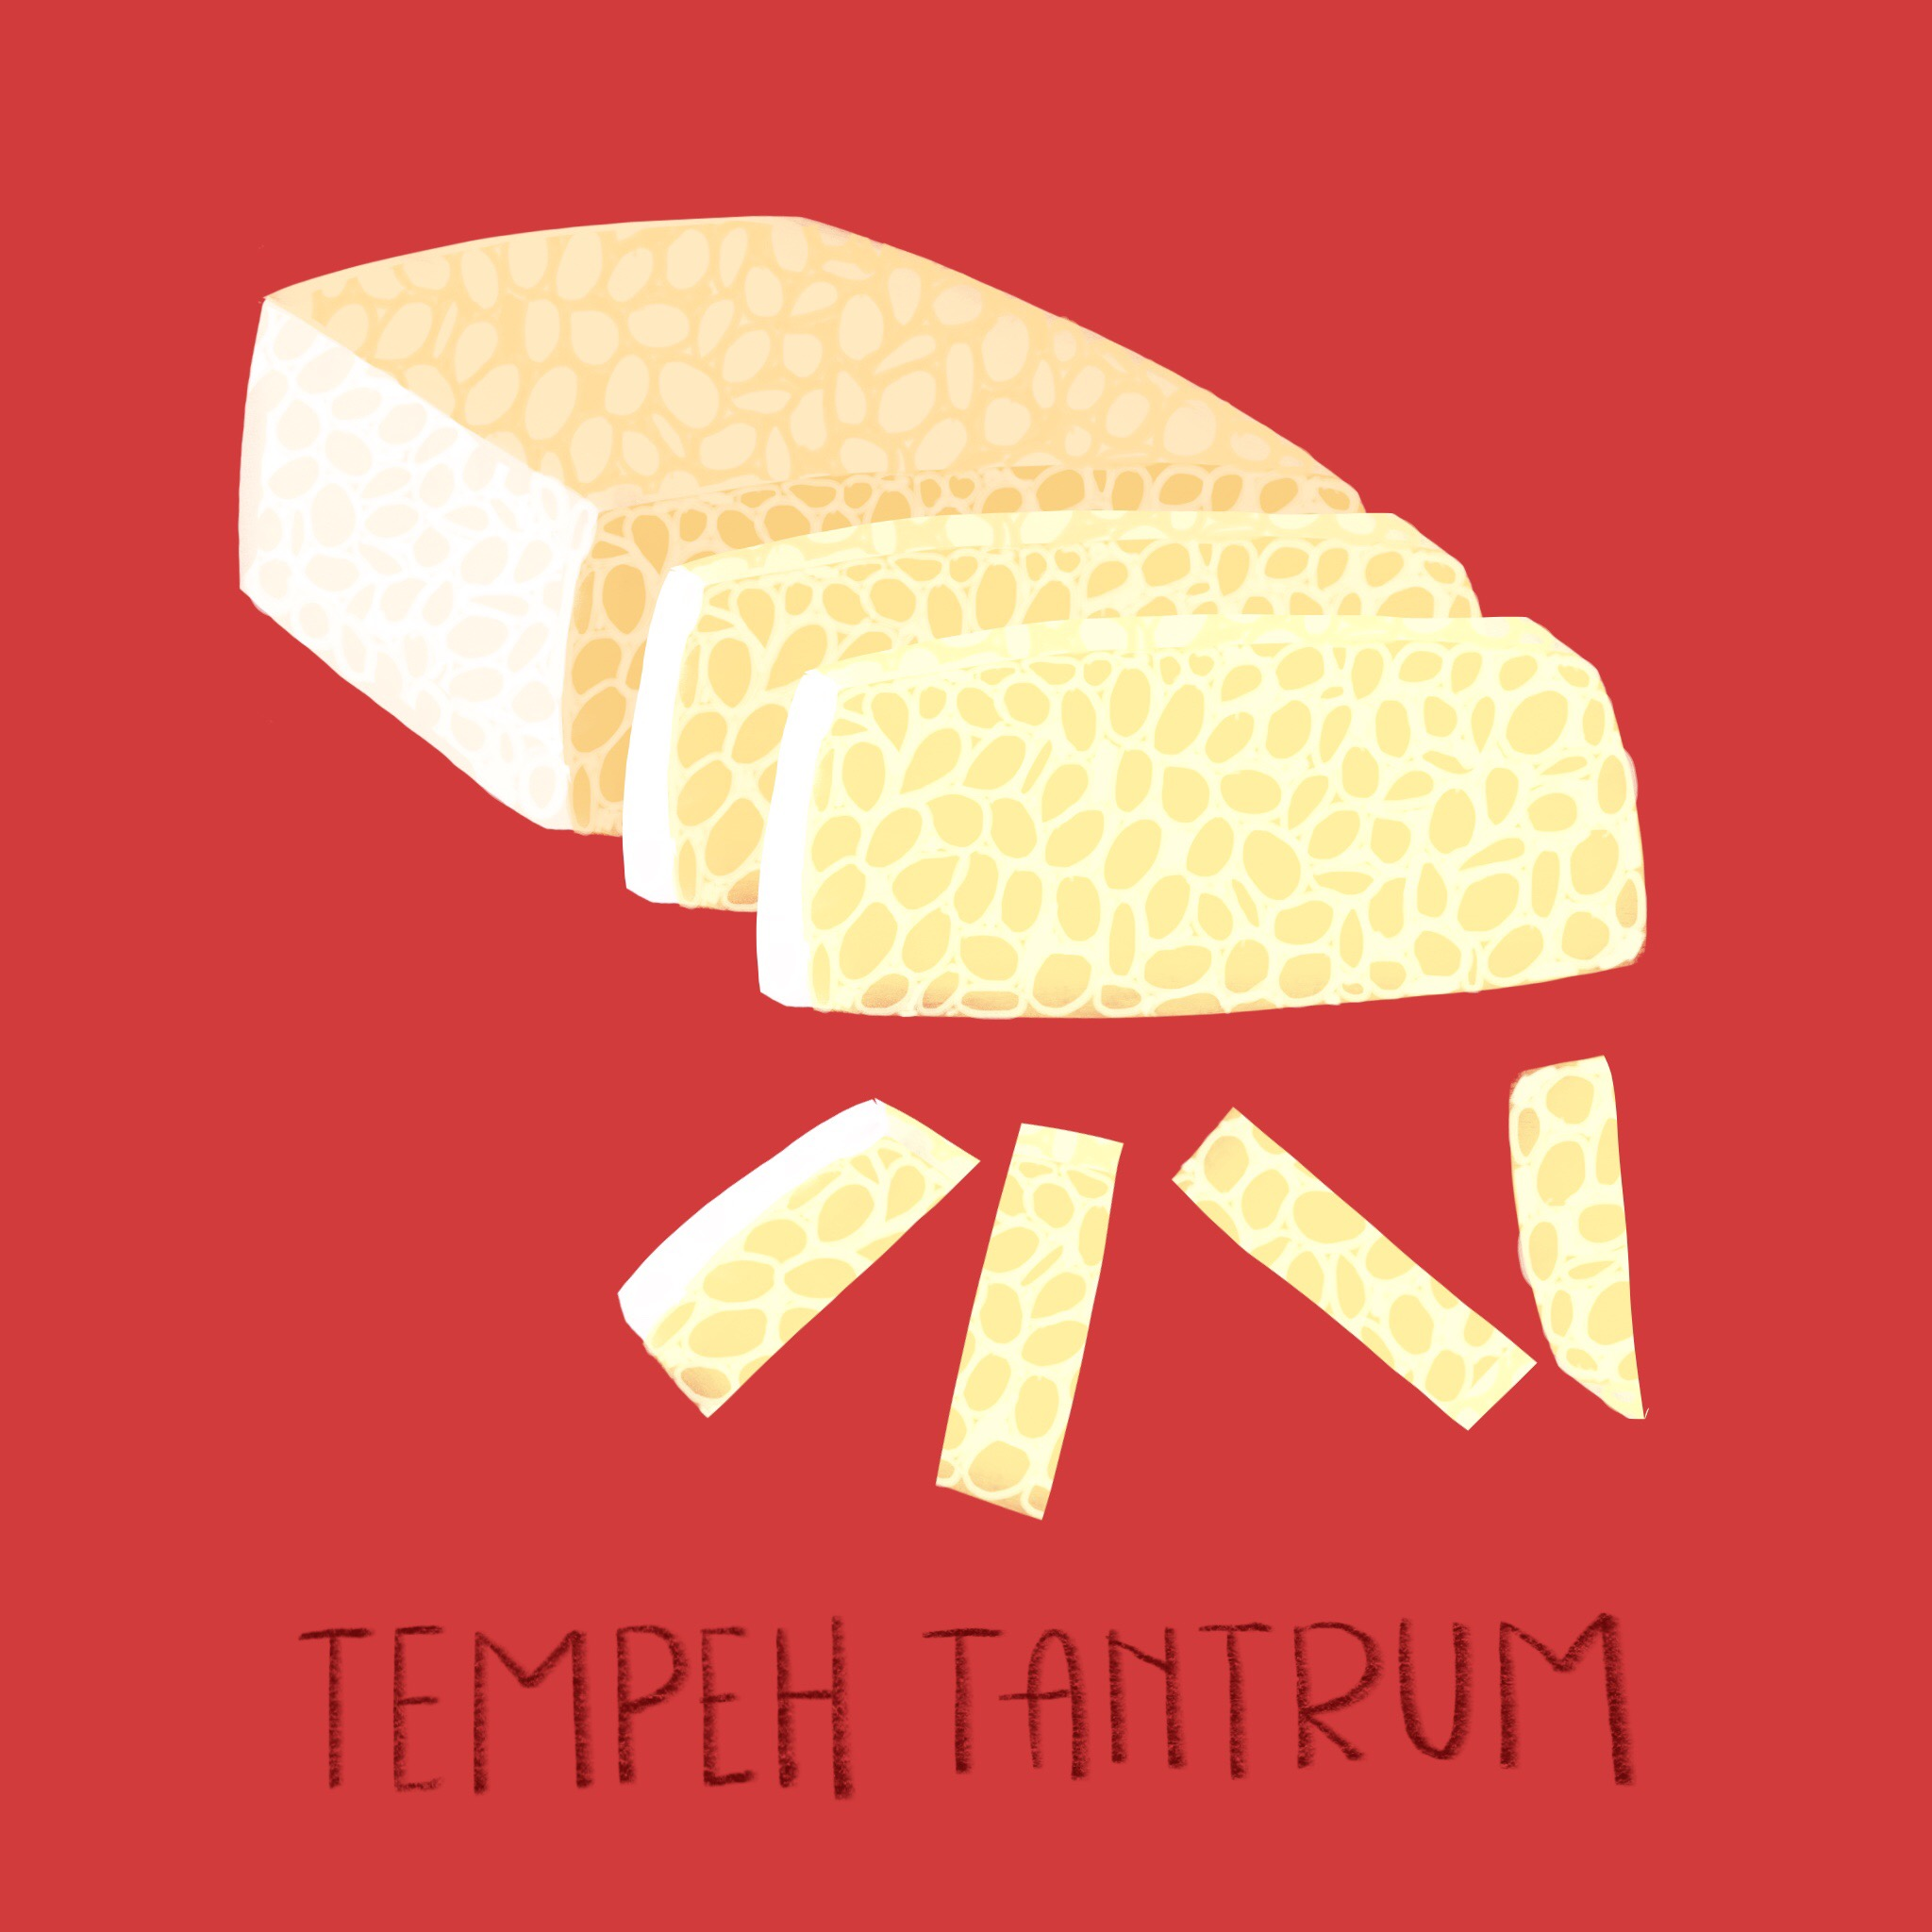 57_-_Tempeh_Tantrum.jpg